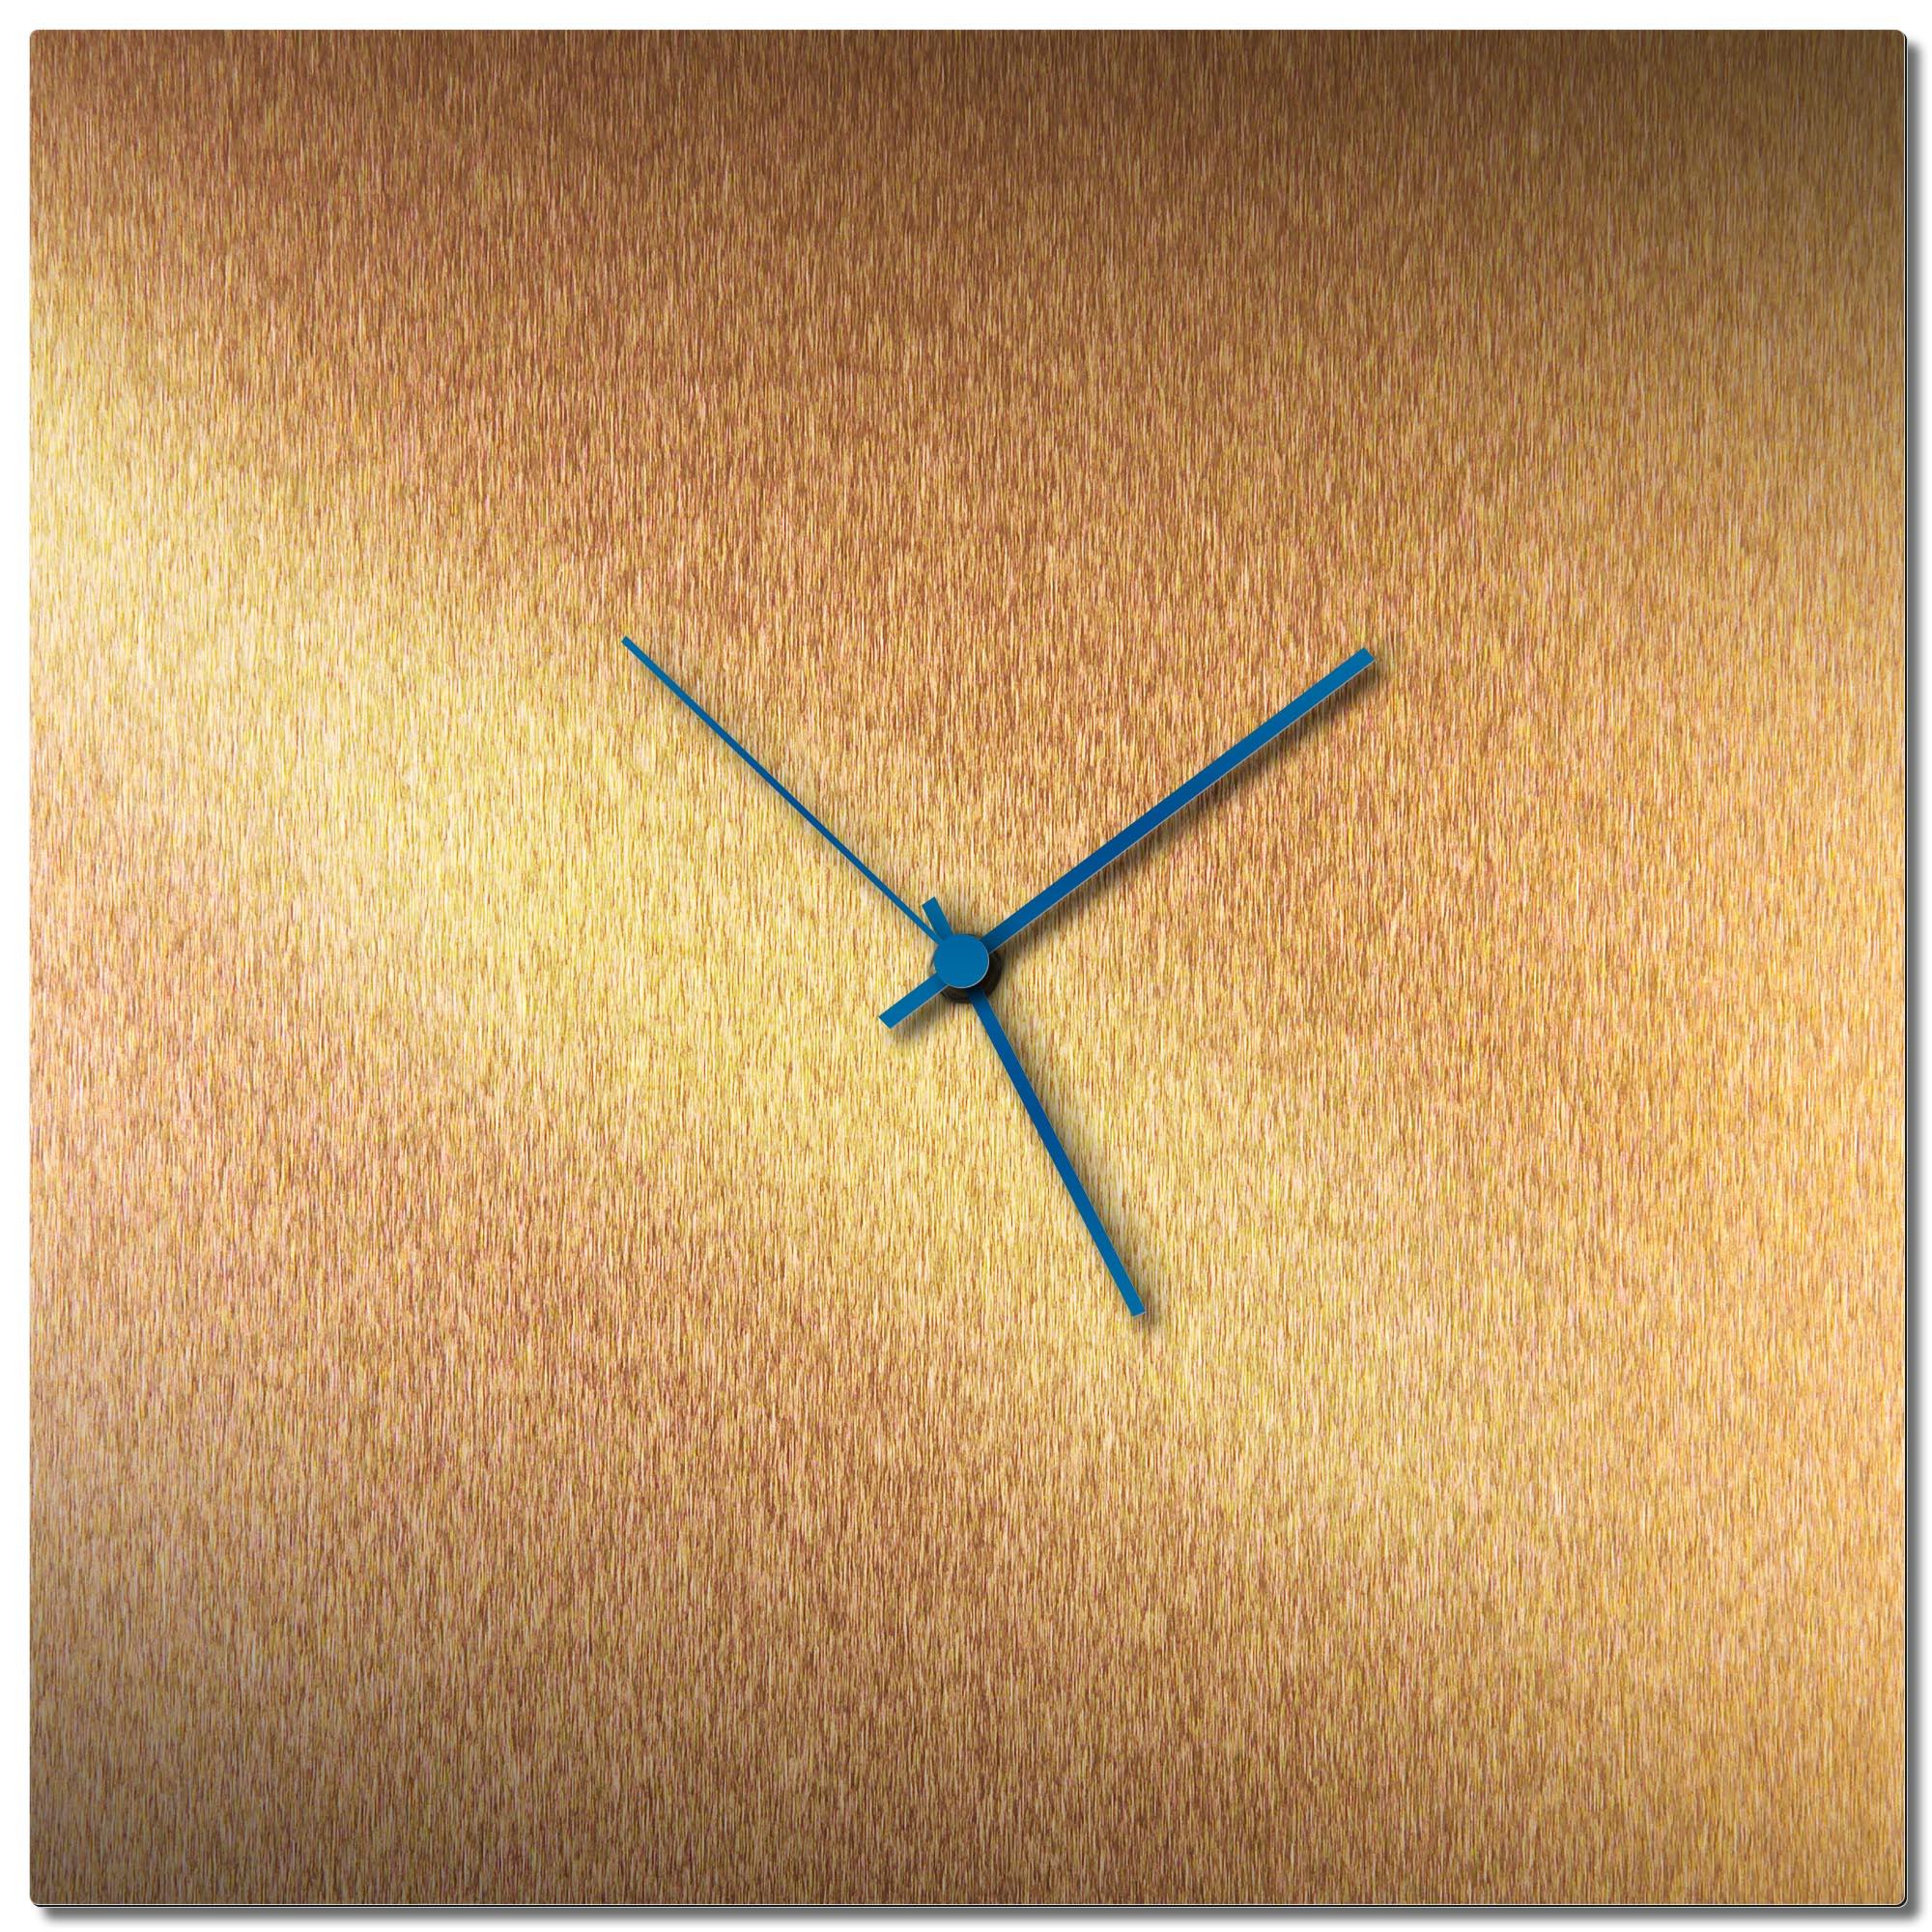 Adam Schwoeppe 'Bronzesmith Square Clock Blue' Midcentury Modern Style Wall Clock